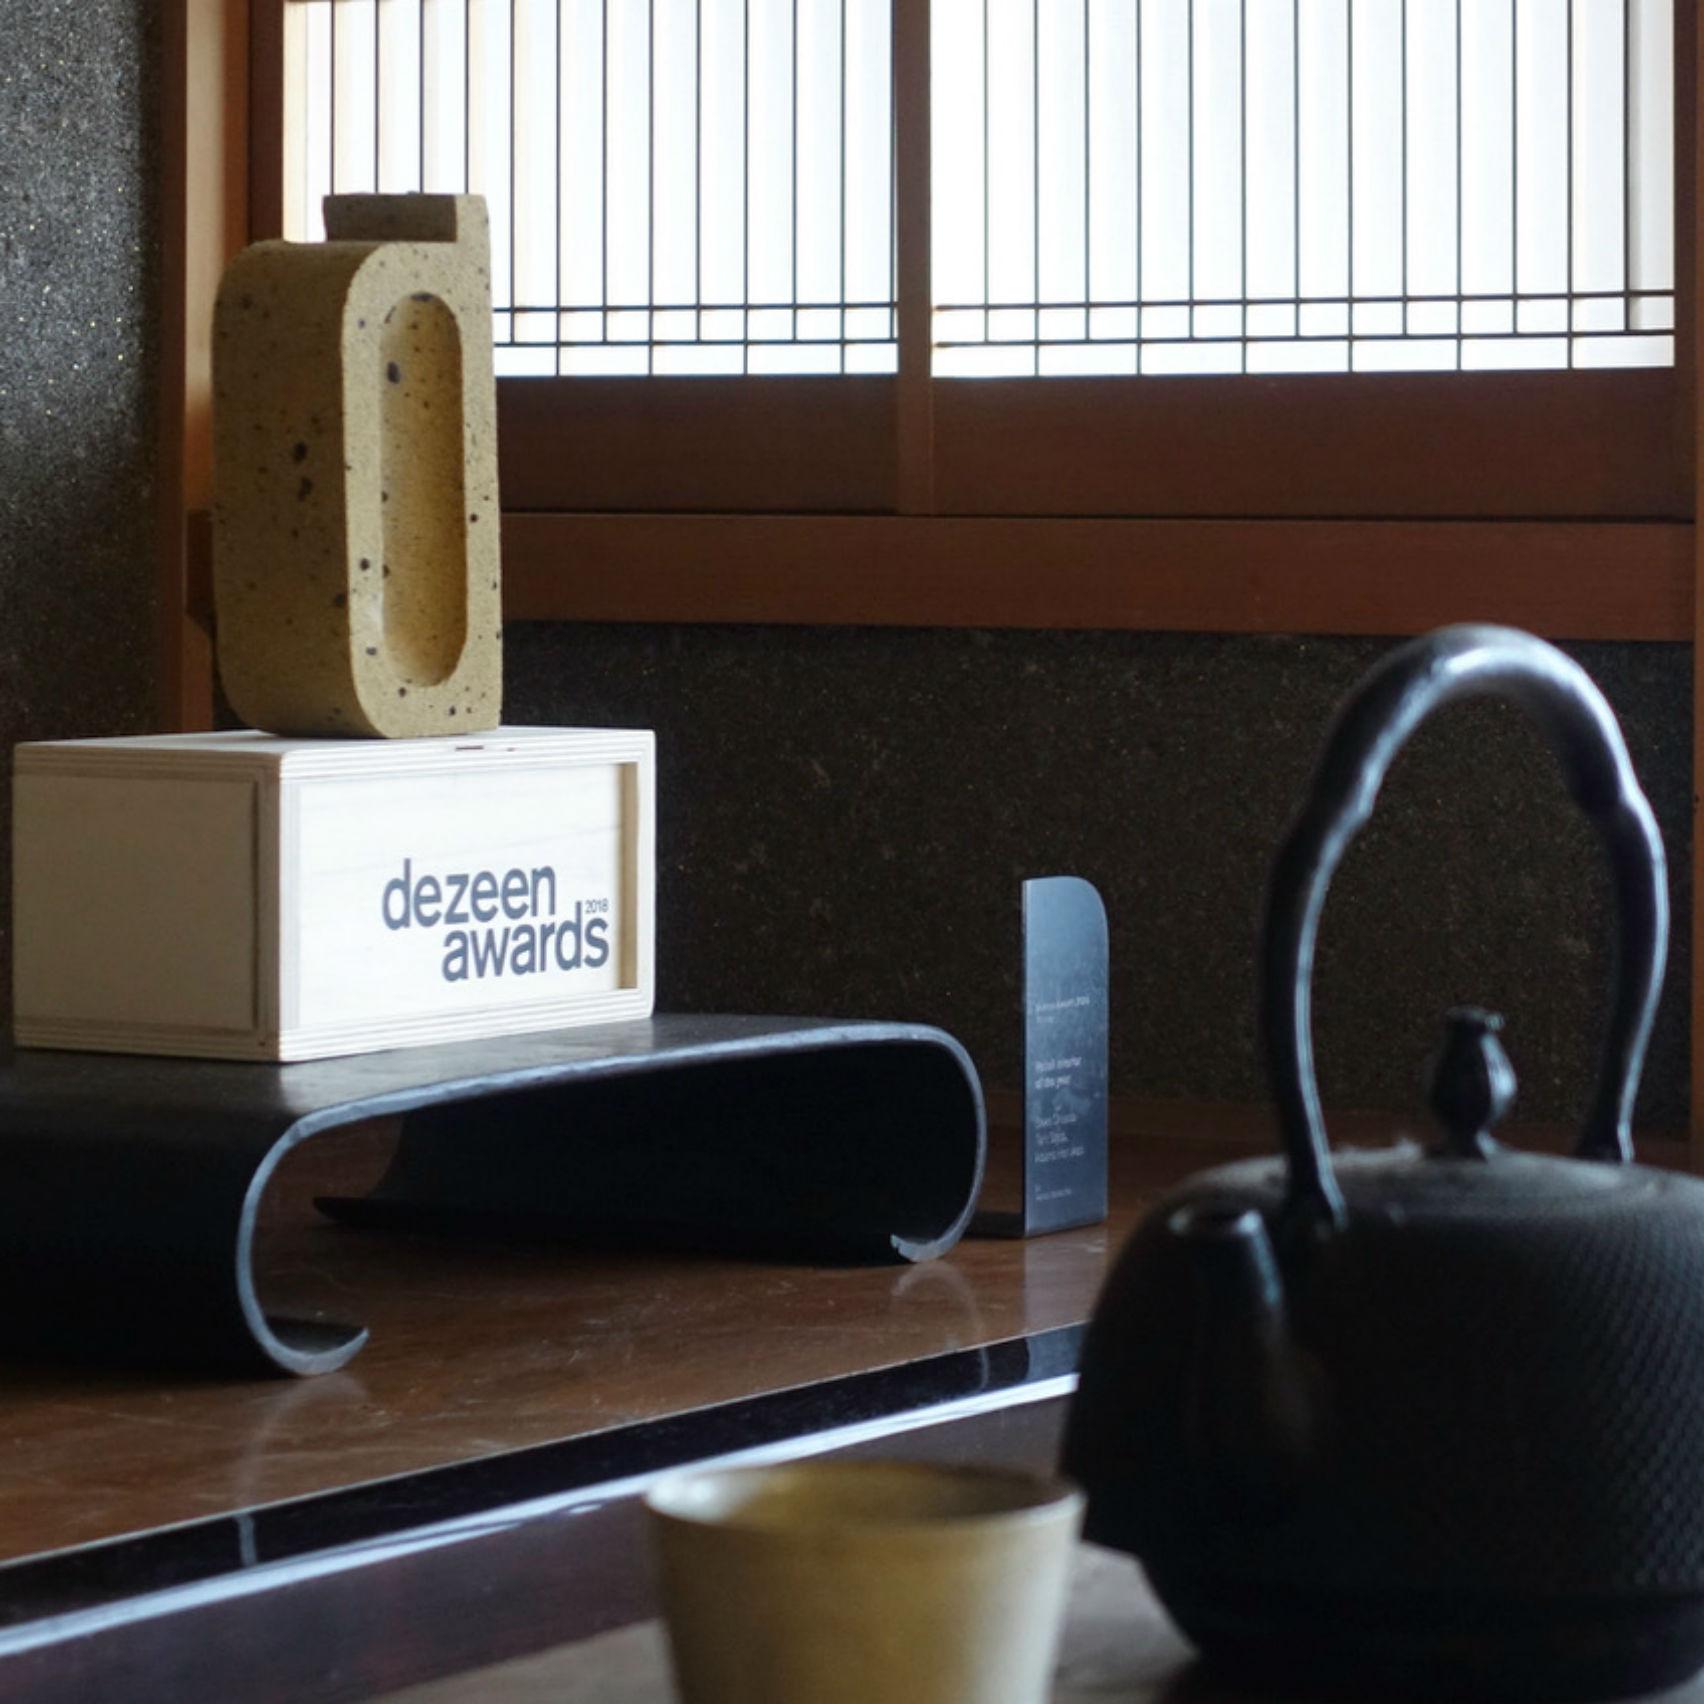 Yagyug Douguten's Dezeen Awards 2018 trophy for retail interior of the year